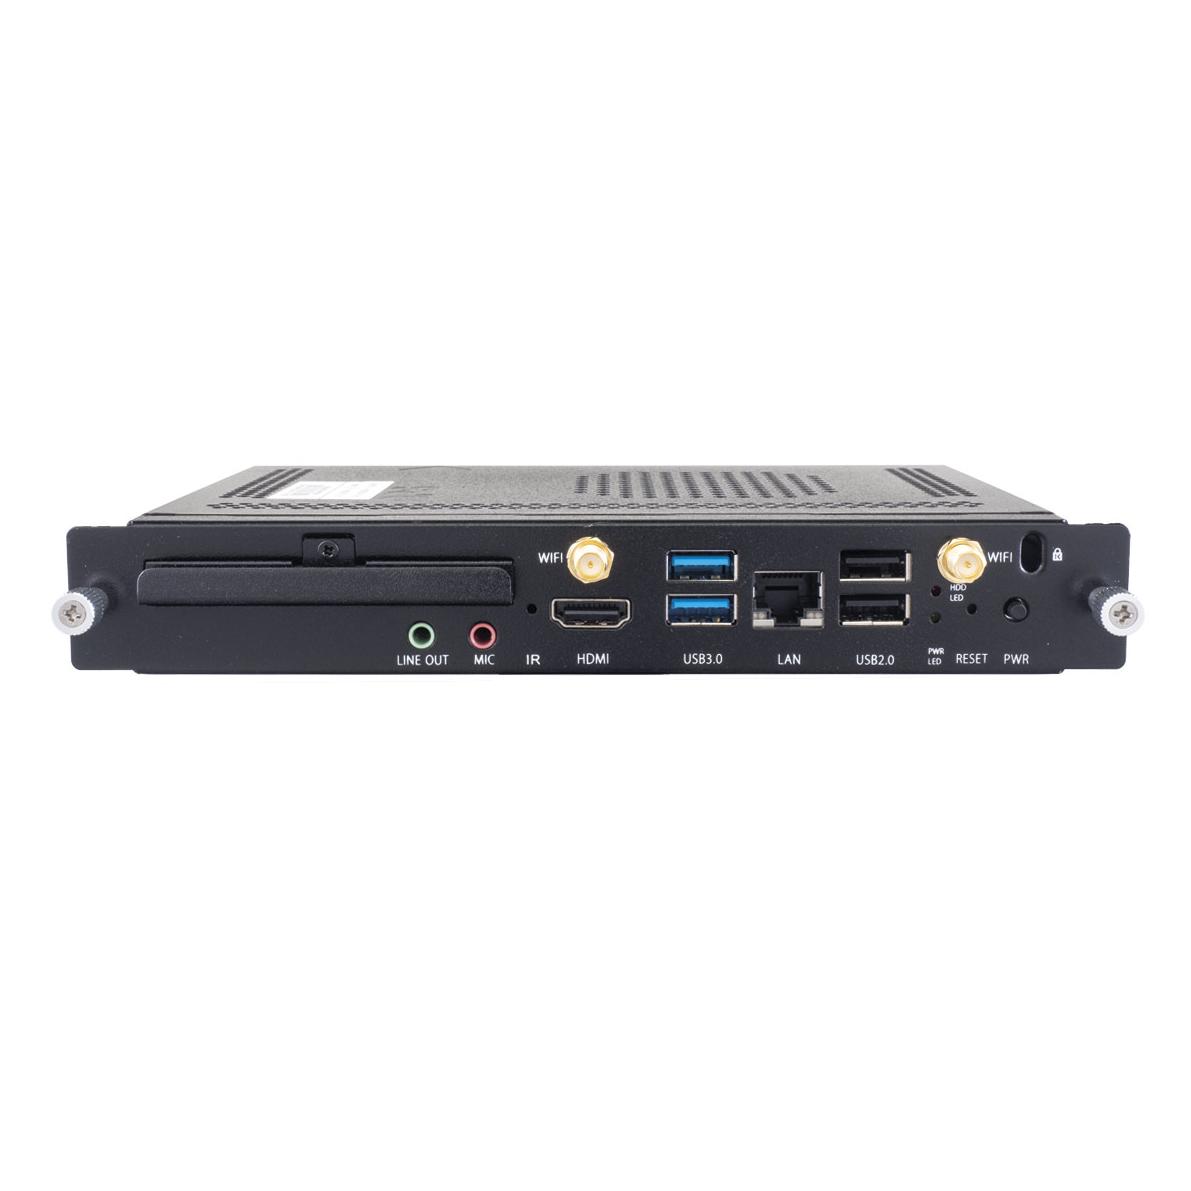 GfdB WAYNE OPS PC-Modul, i5-7200U 2.5GHz, 256 SSD, 8GB RAM 710656